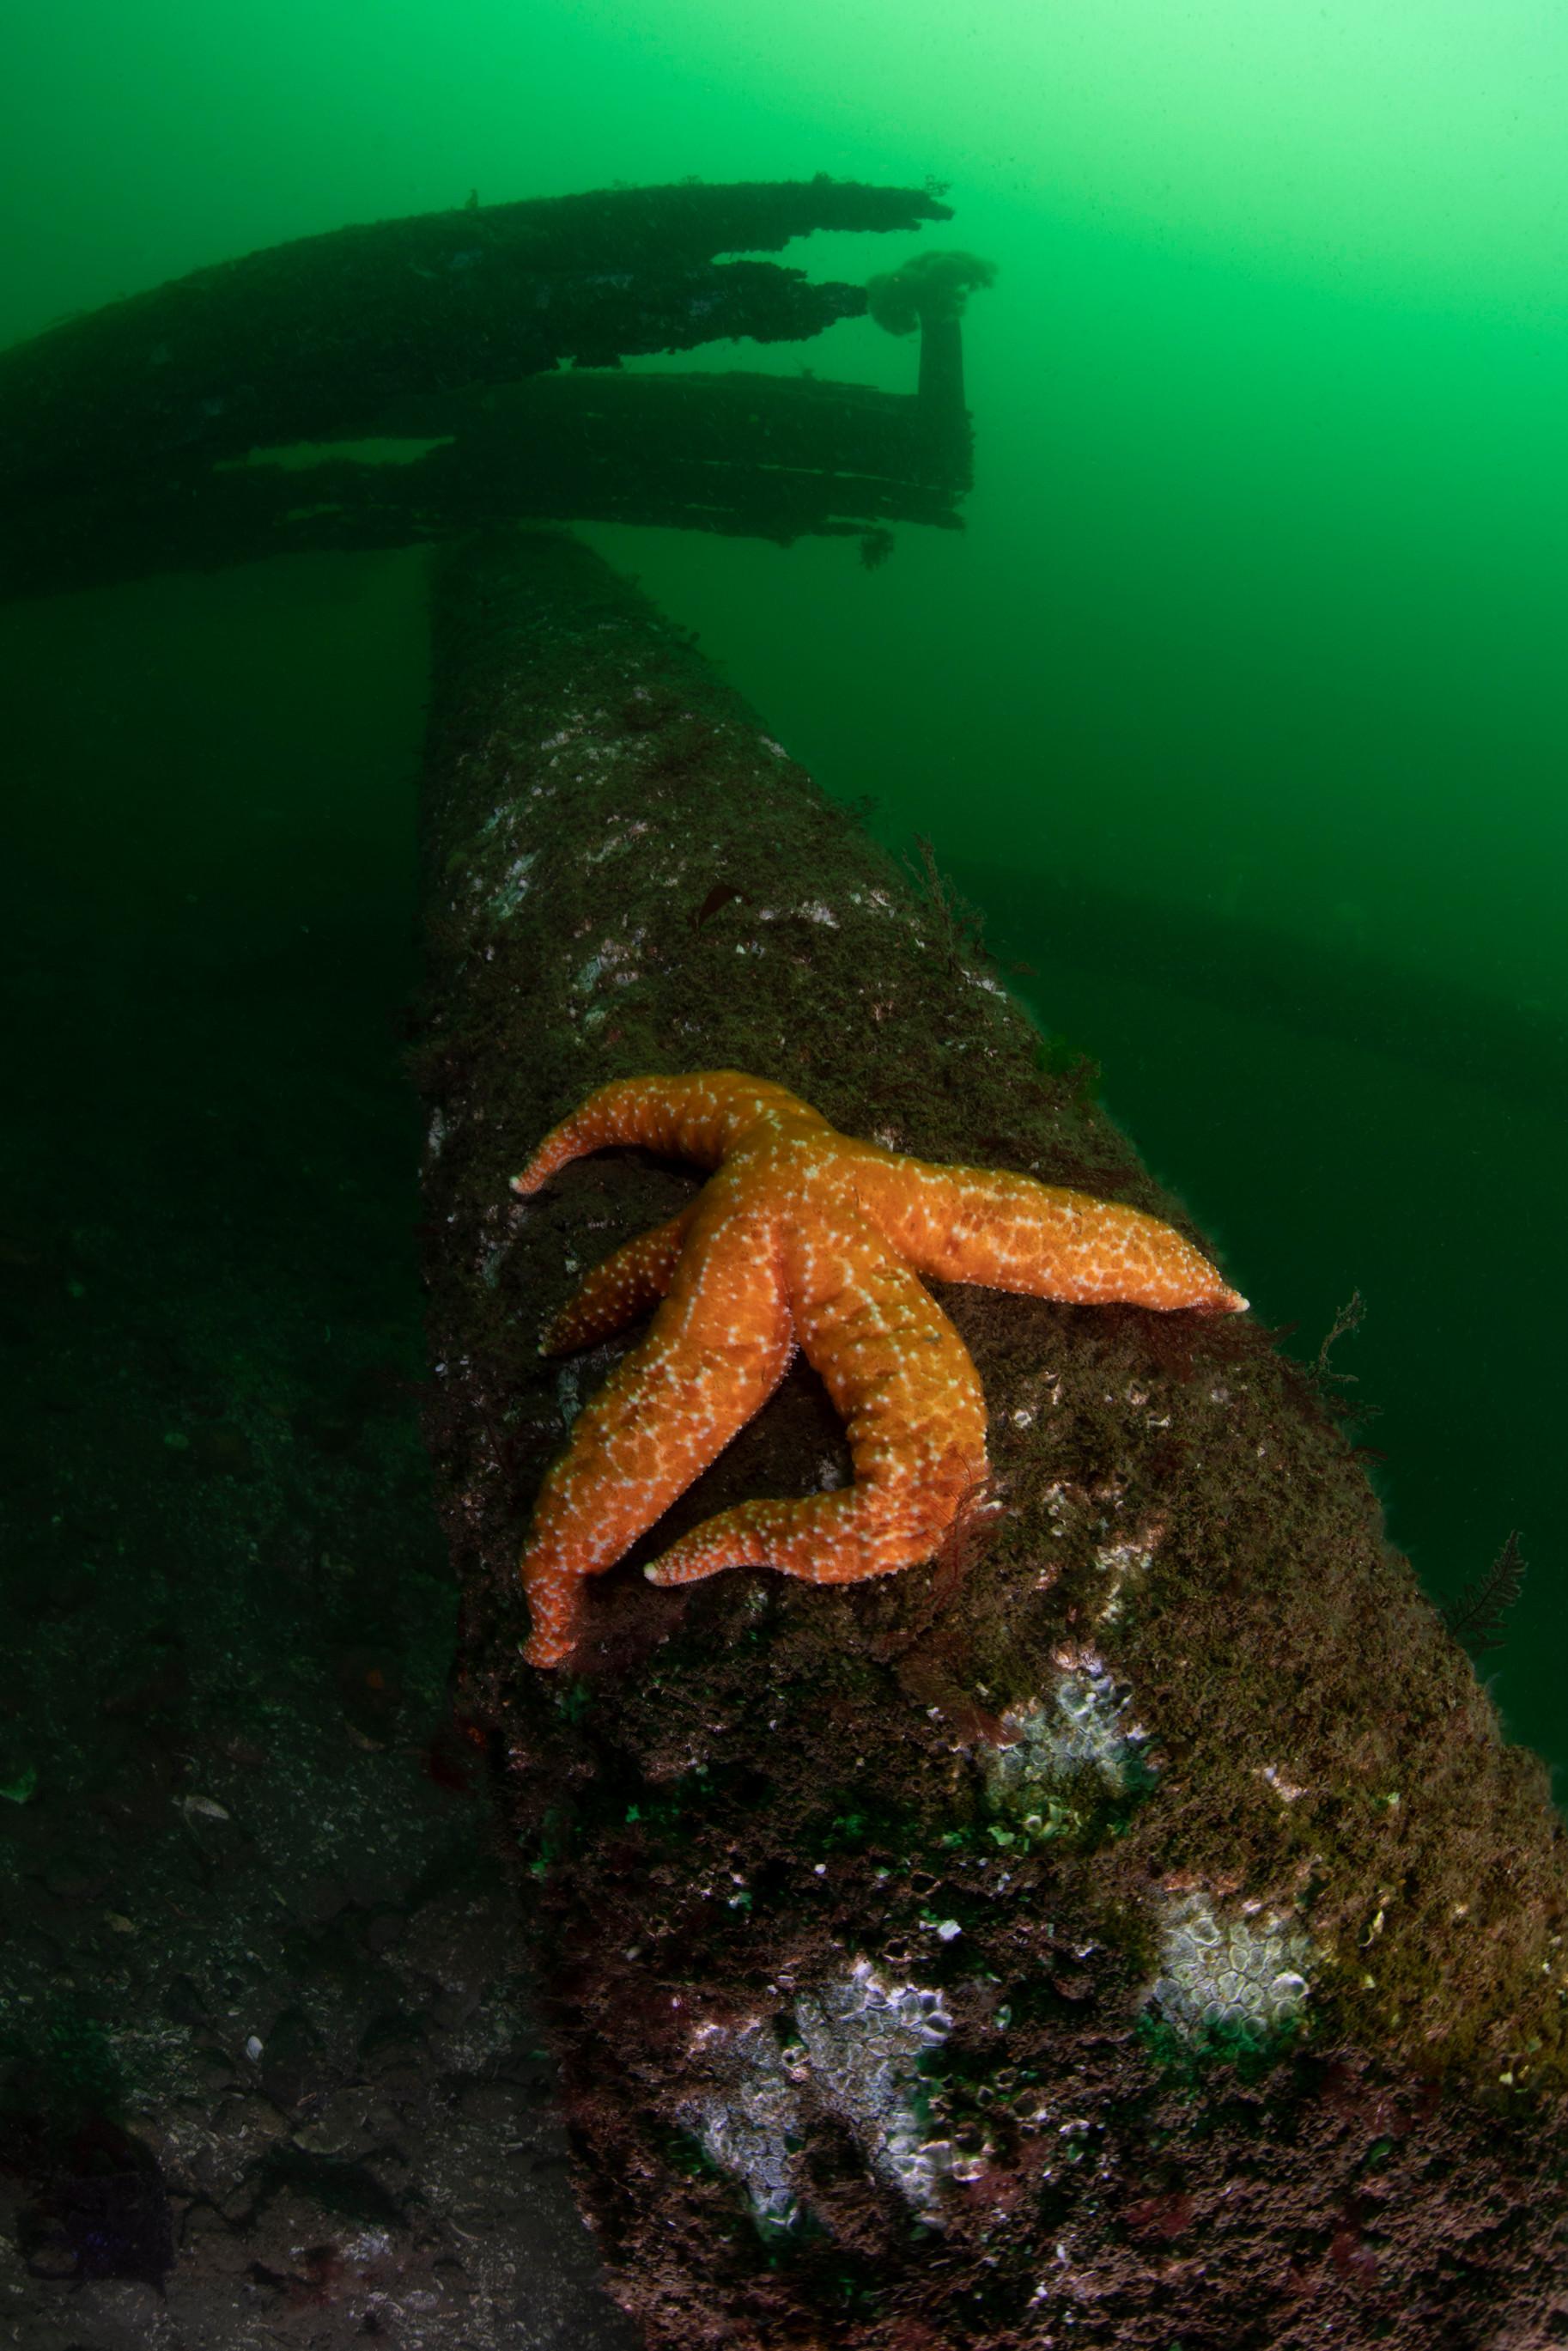 Starfish on Pilings